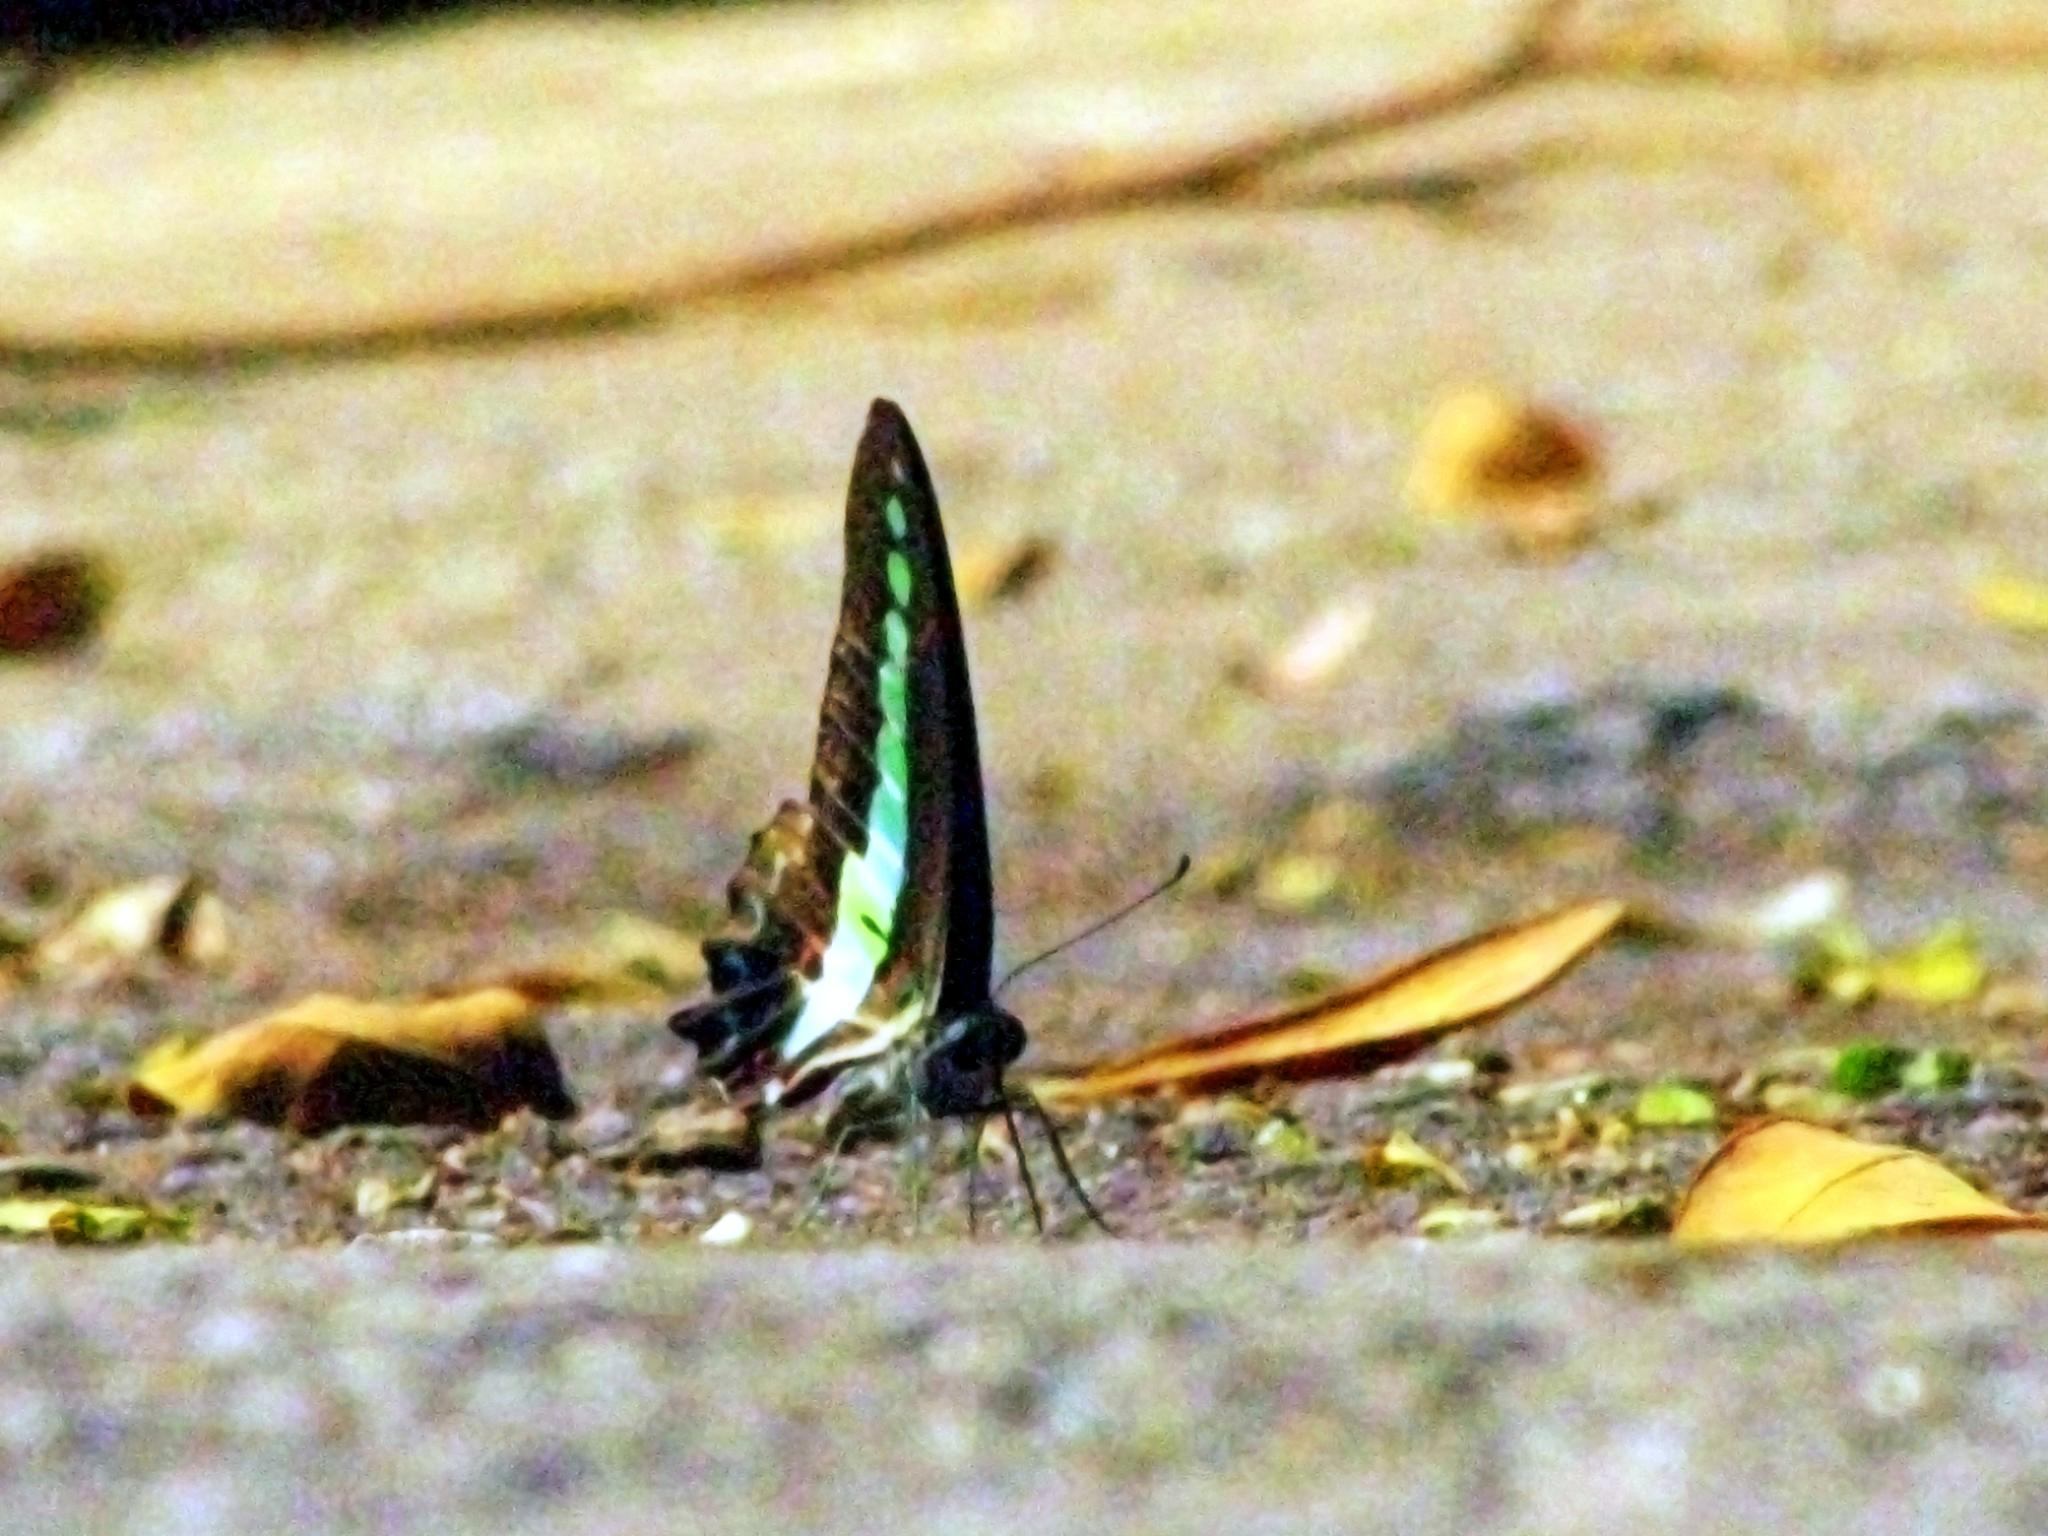 Butterfly by Dhruvil Mistry